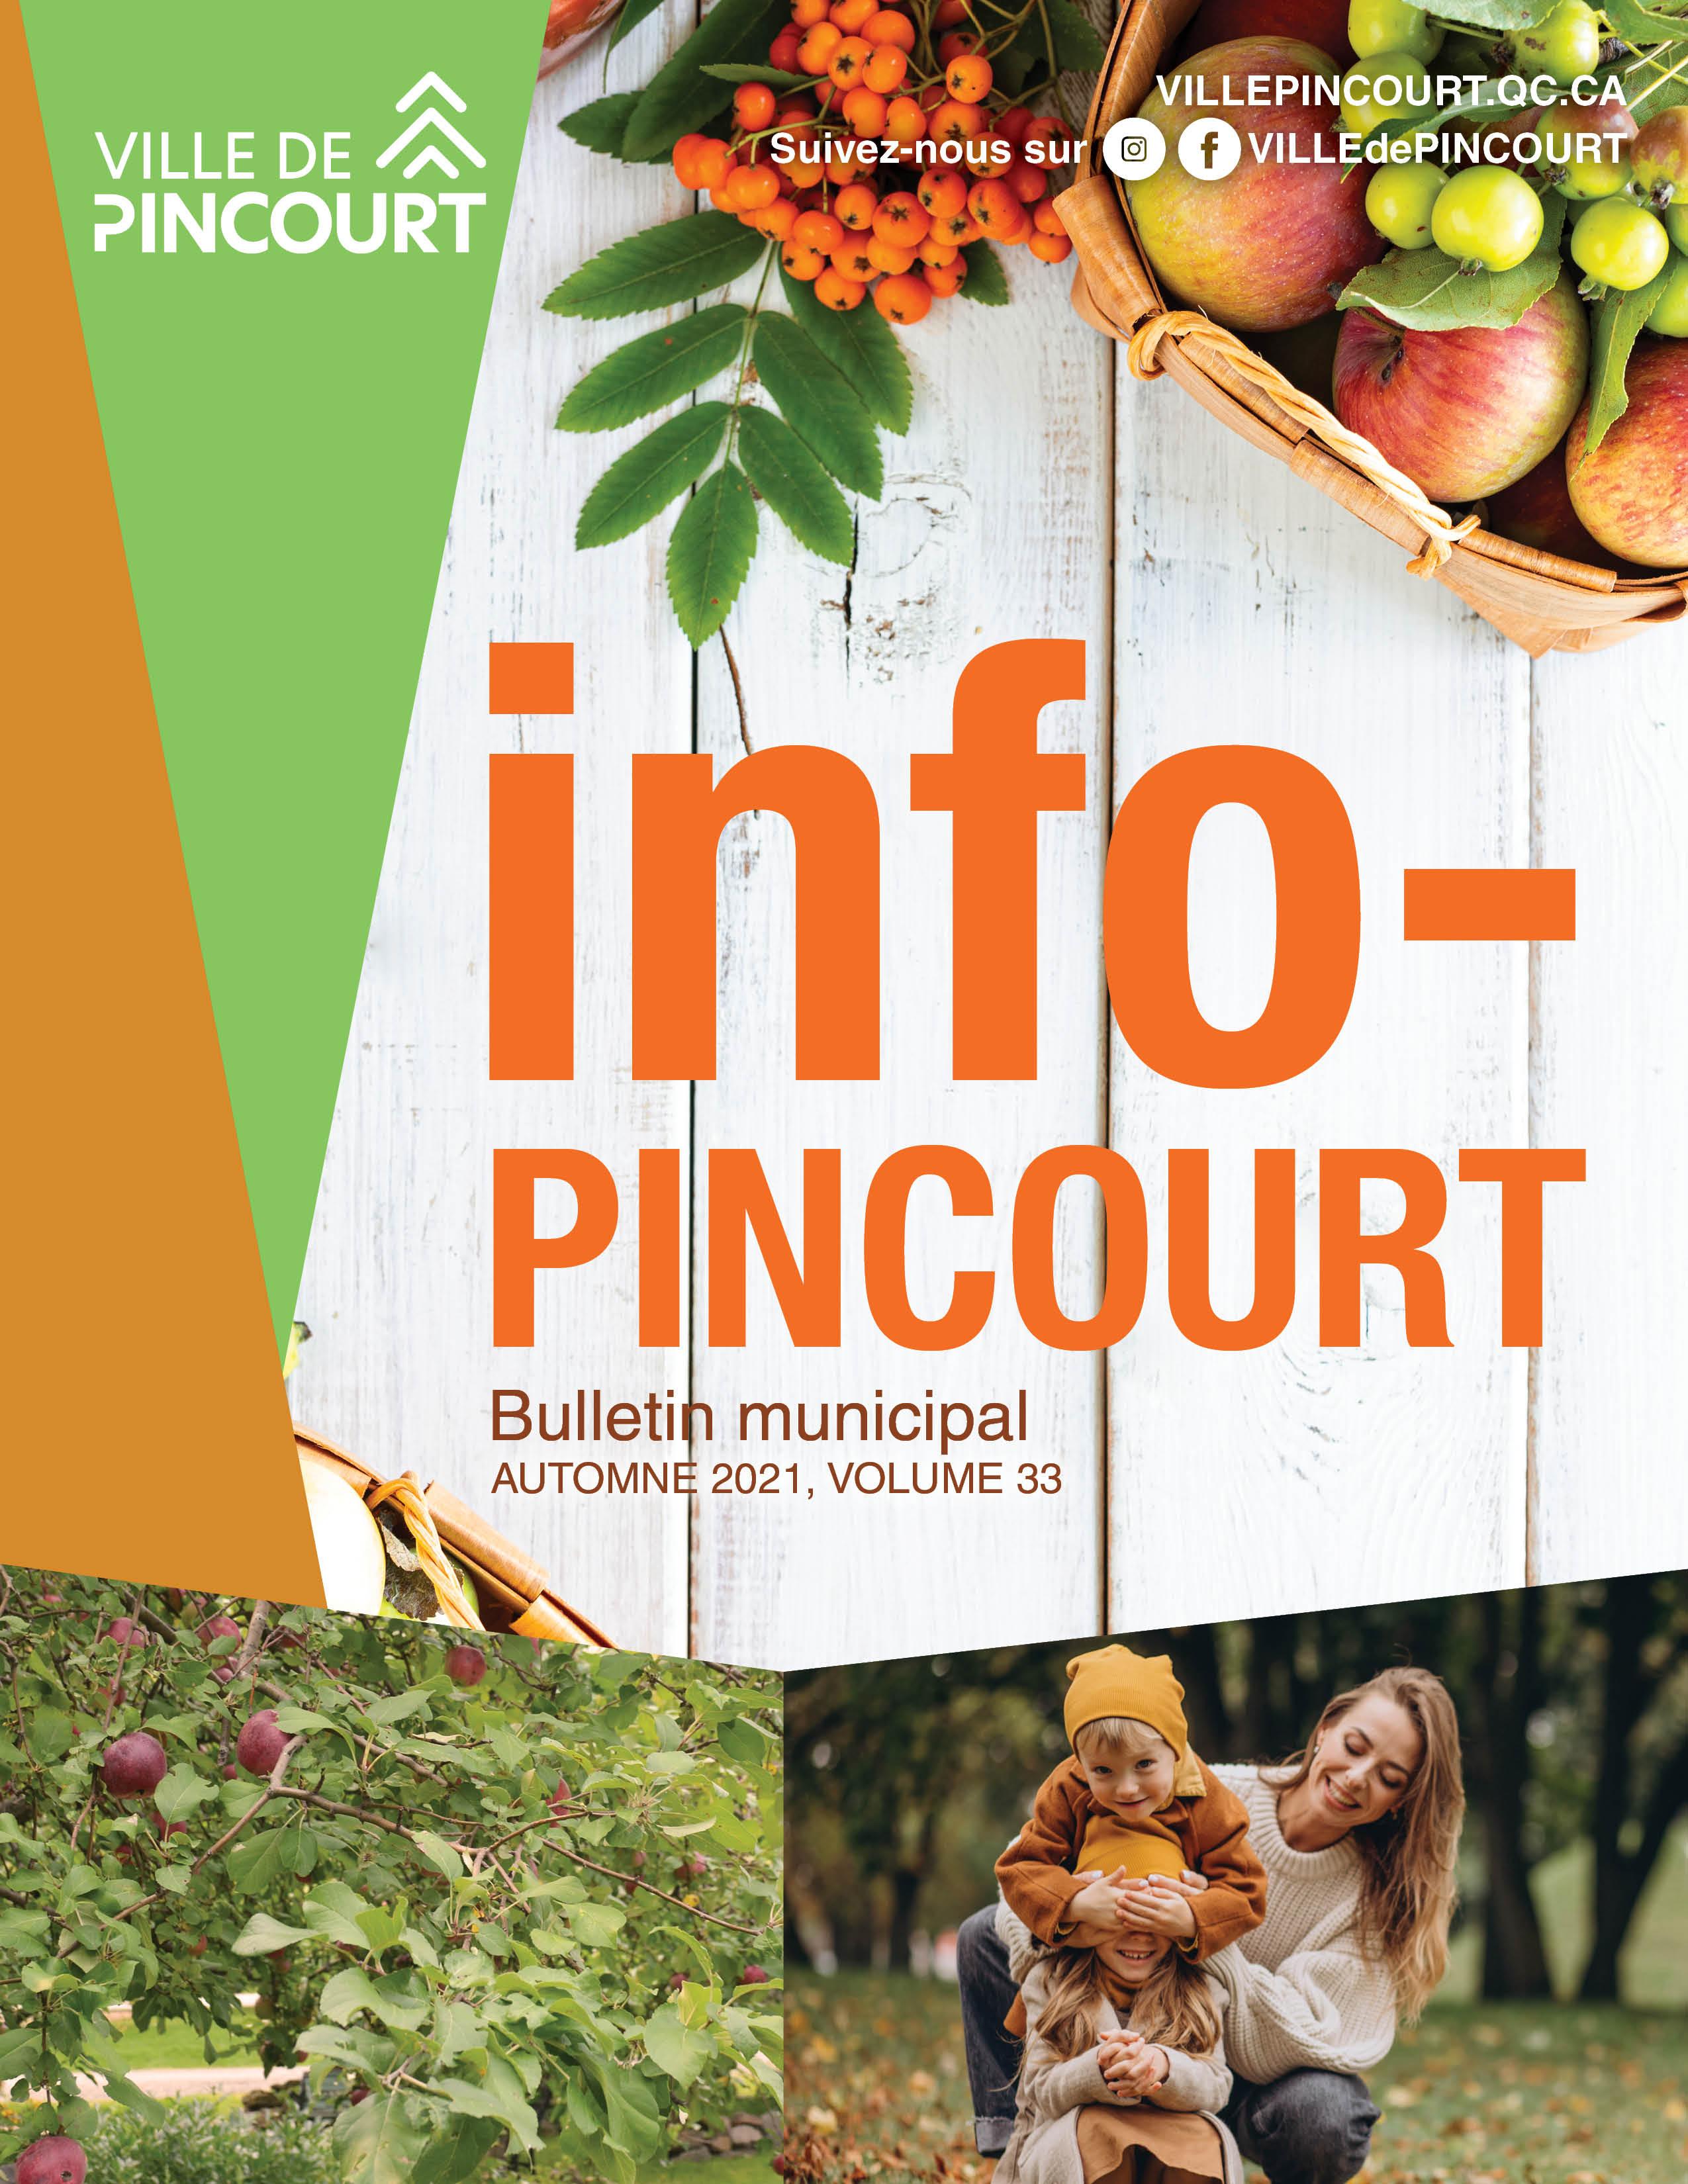 info-pincourt-automne-2021-couverture.jpg (692 KB)